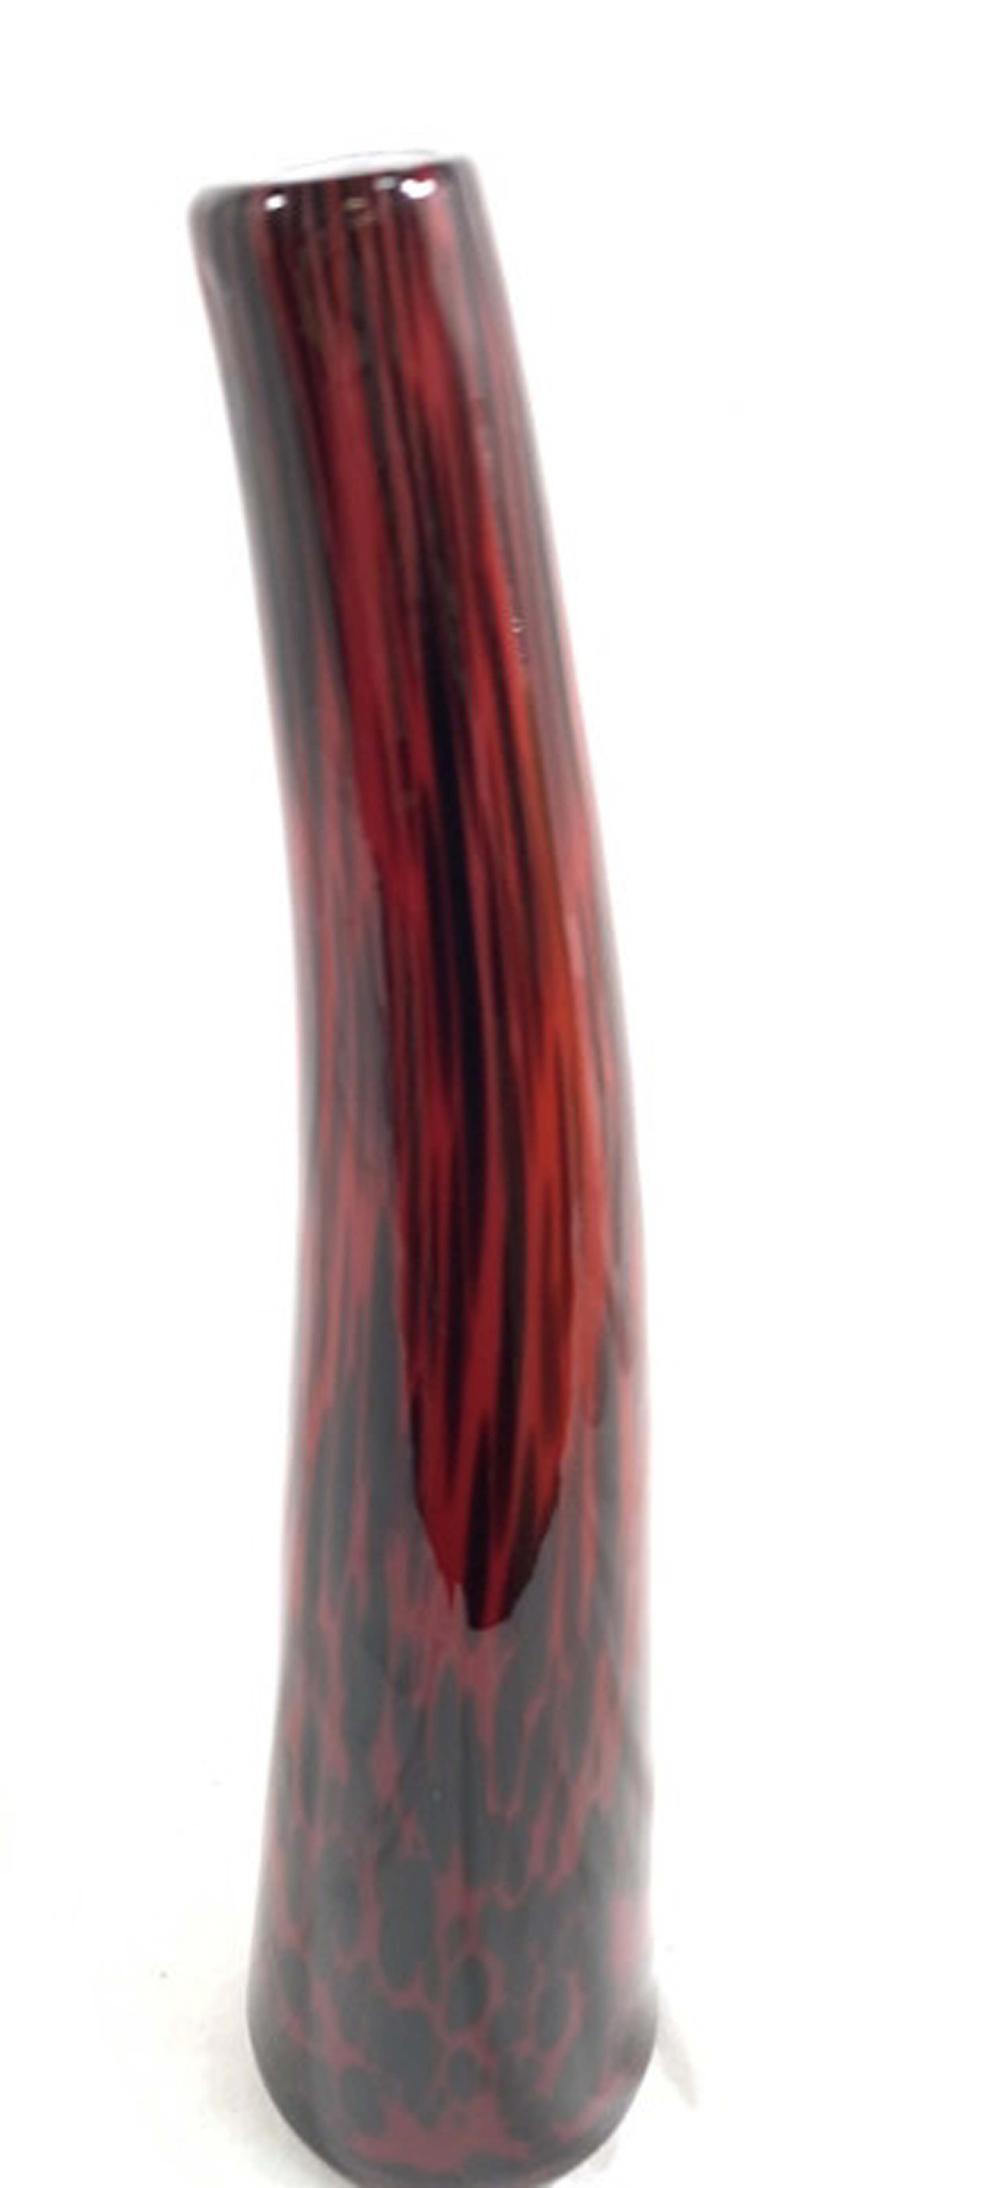 SUPERB RED/ONYX MODERNISTIC MURANO GLASS VASE